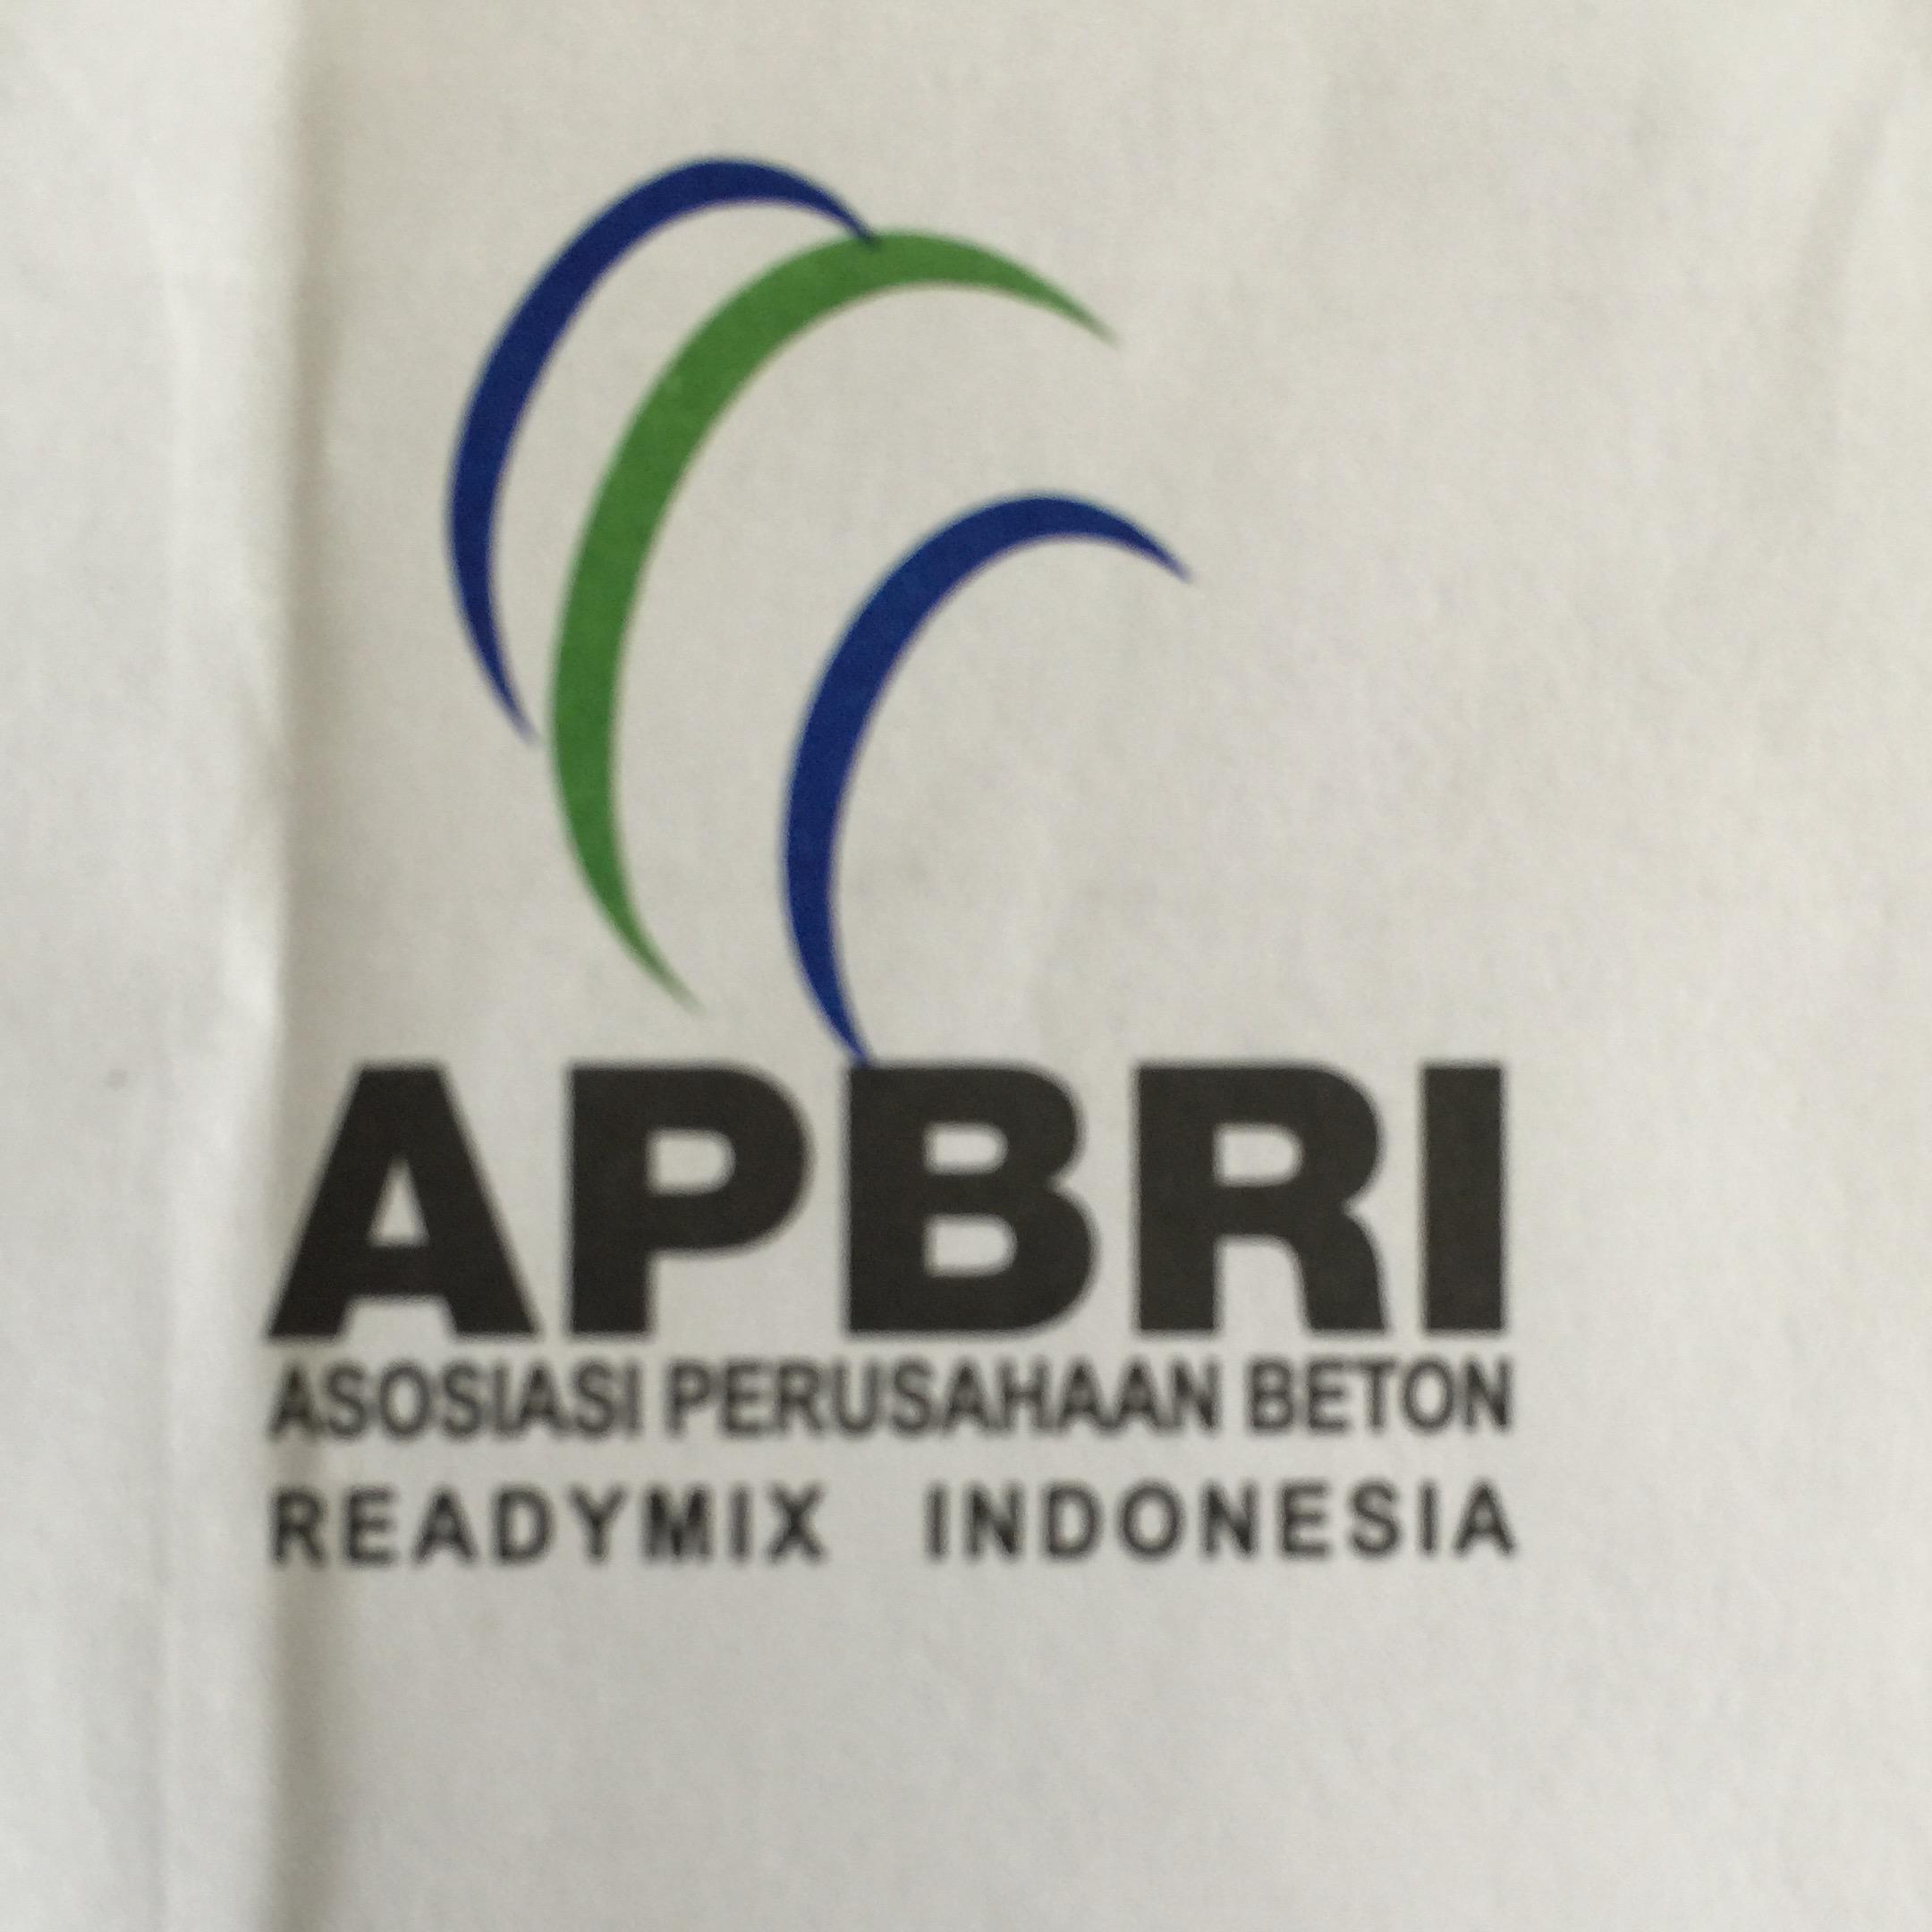 Asosiasi Perusahaan Beton Ready Mix Indonesia